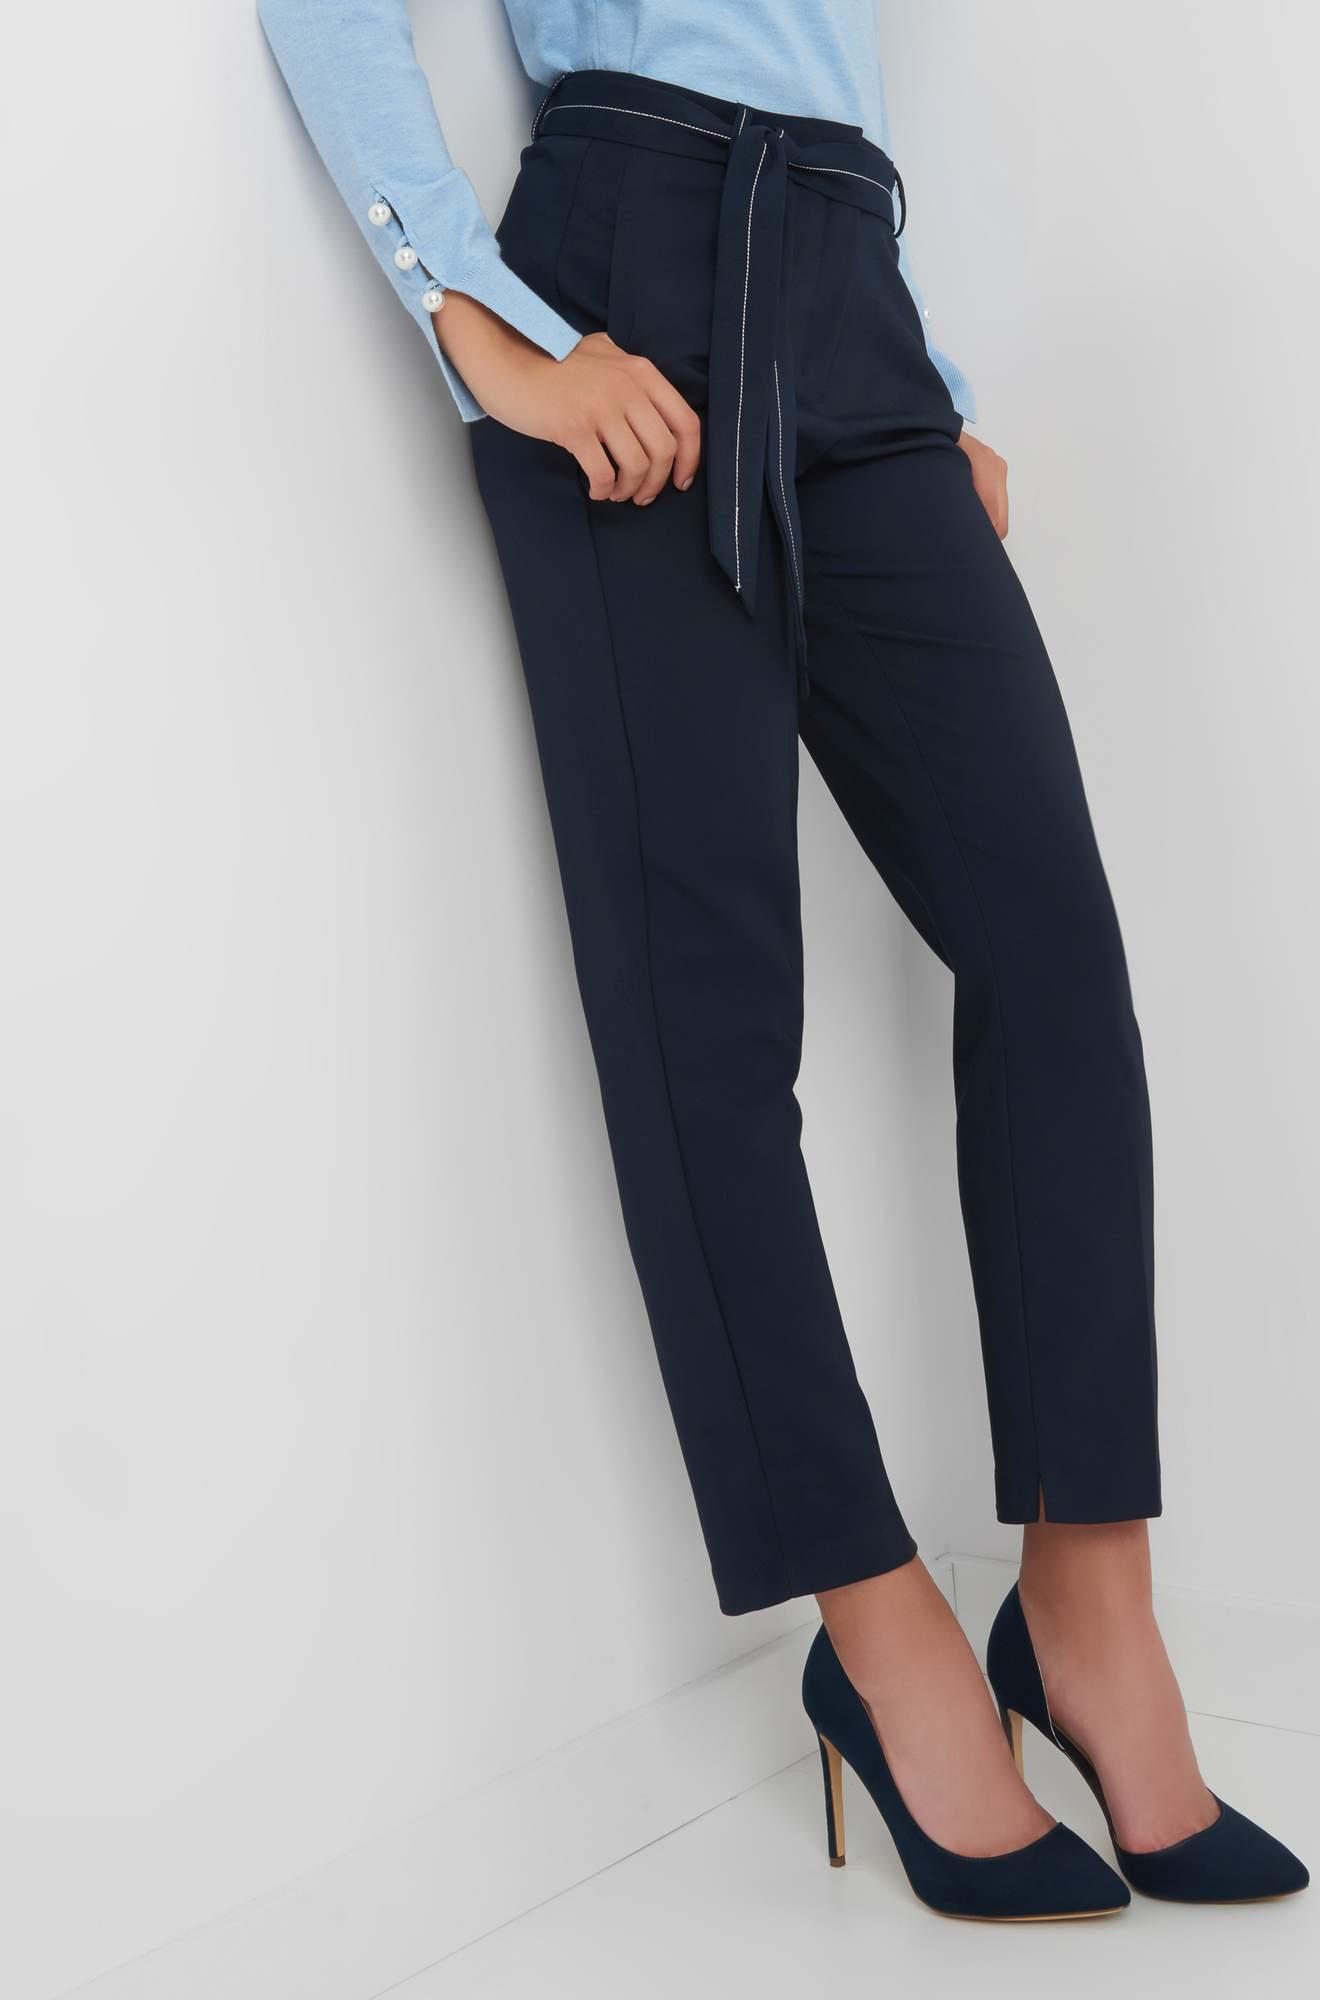 Ankle Hose mit Ziernaht